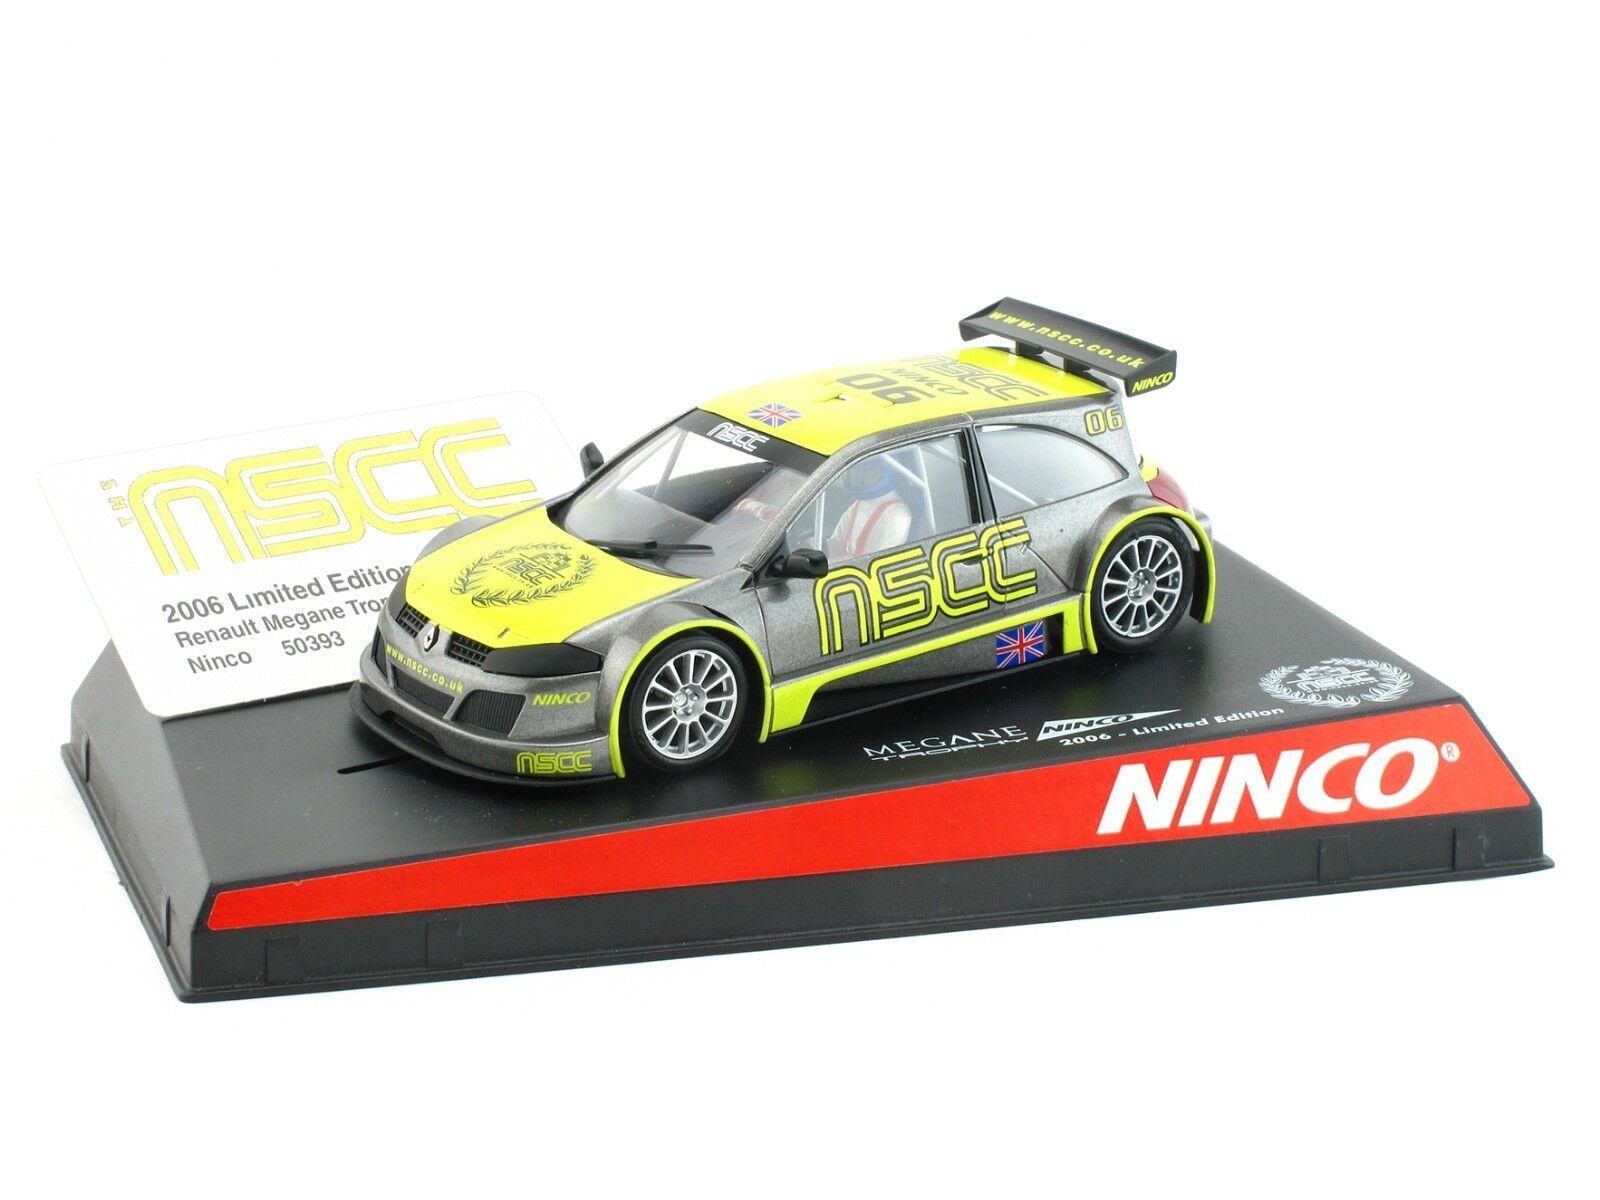 NINCO Renault Mégane  NSCC  Ltd. Ed. ref. 50393 1 32 Slot Car